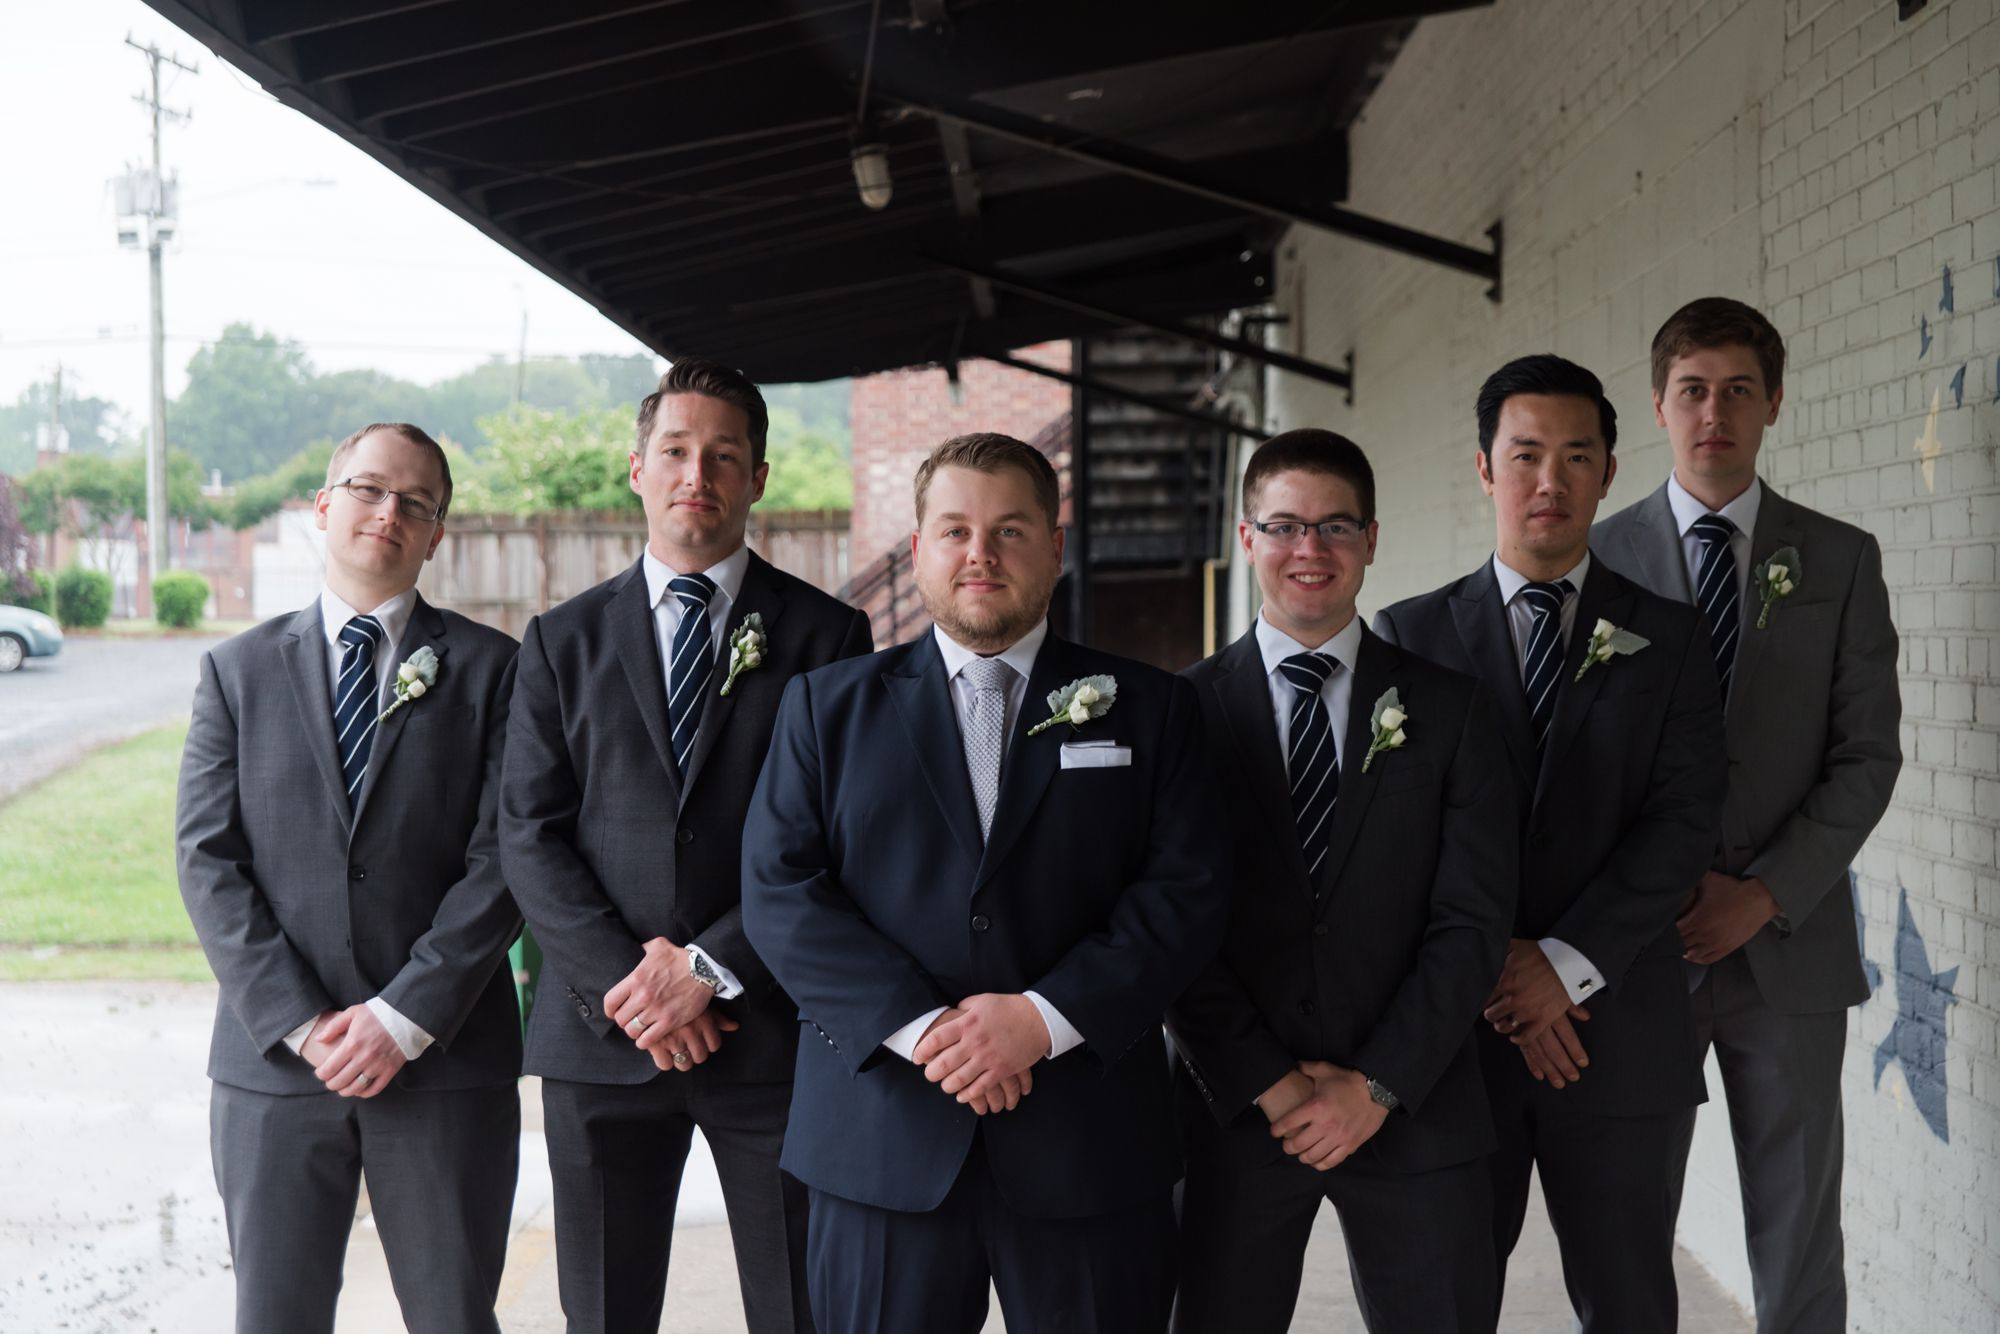 uptown-charlotte-warhouse-wedding 47